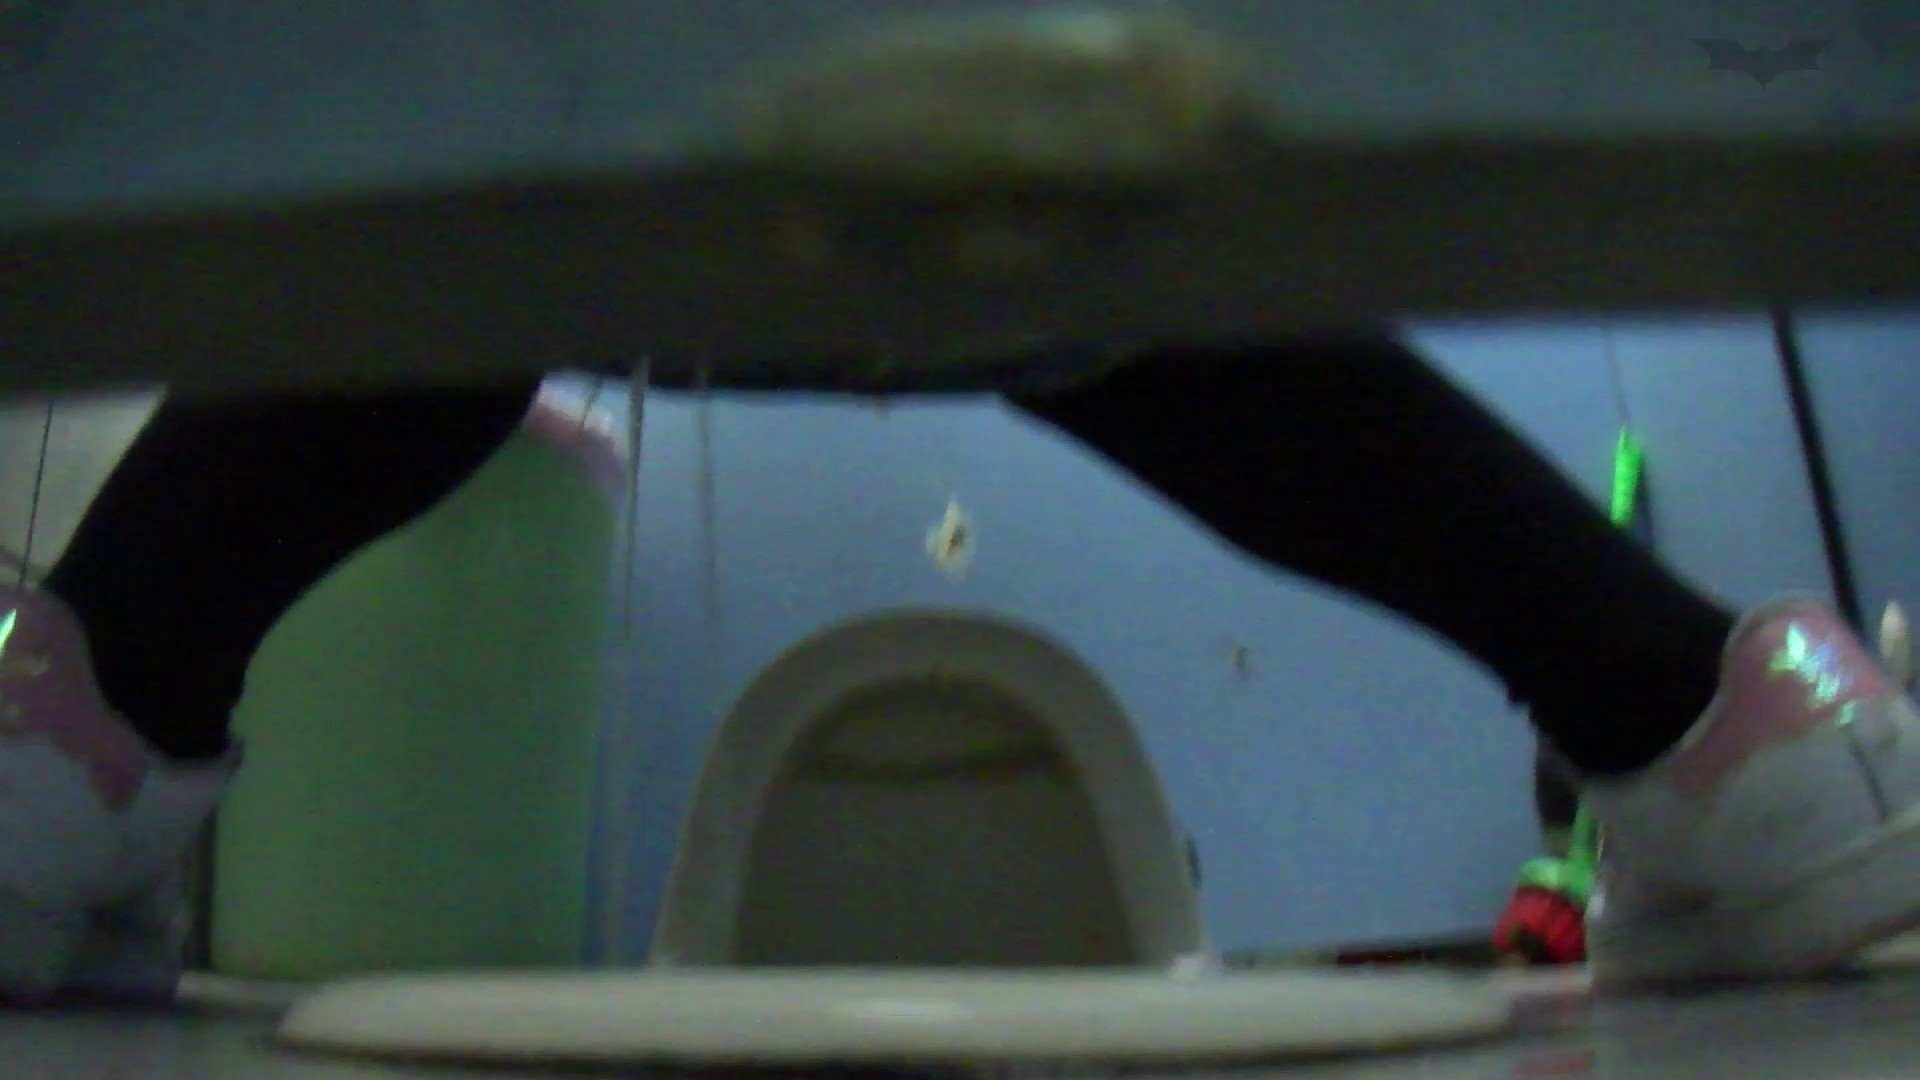 JD盗撮 美女の洗面所の秘密 Vol.78 盛合せ エロ画像 89画像 13